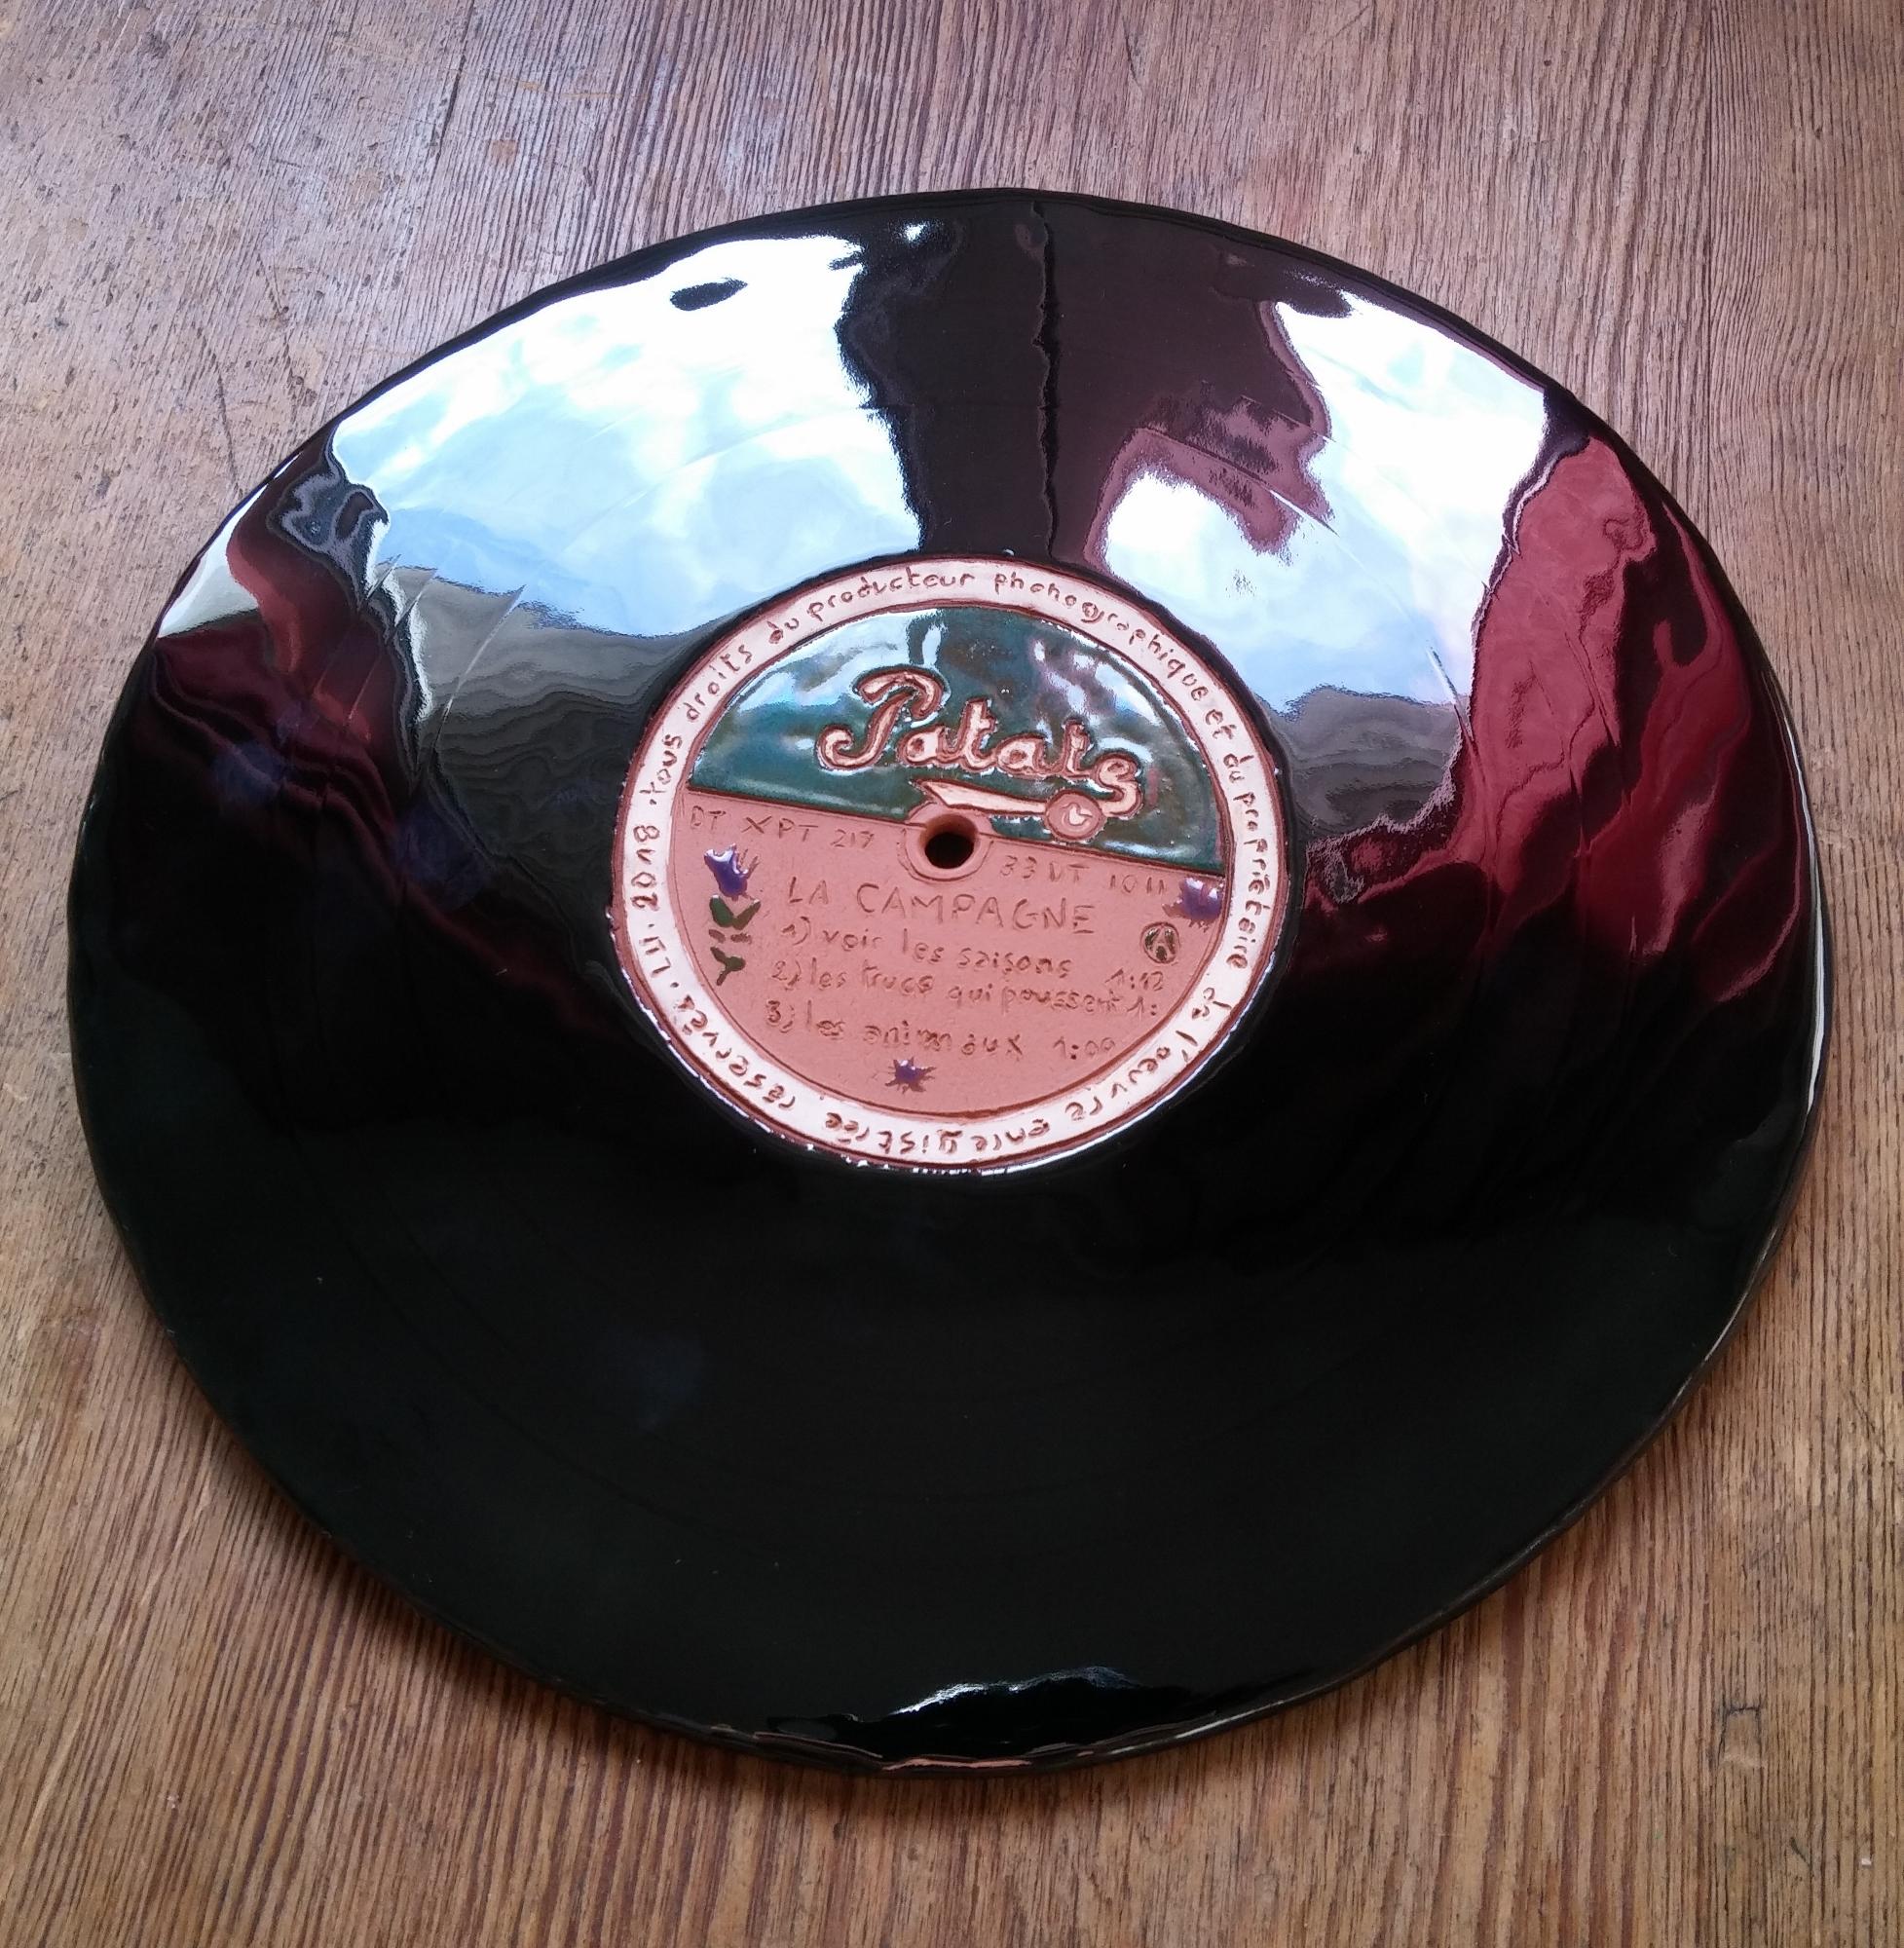 Vinyles, Céramique, Ø 24 cm, 2018 72dpi